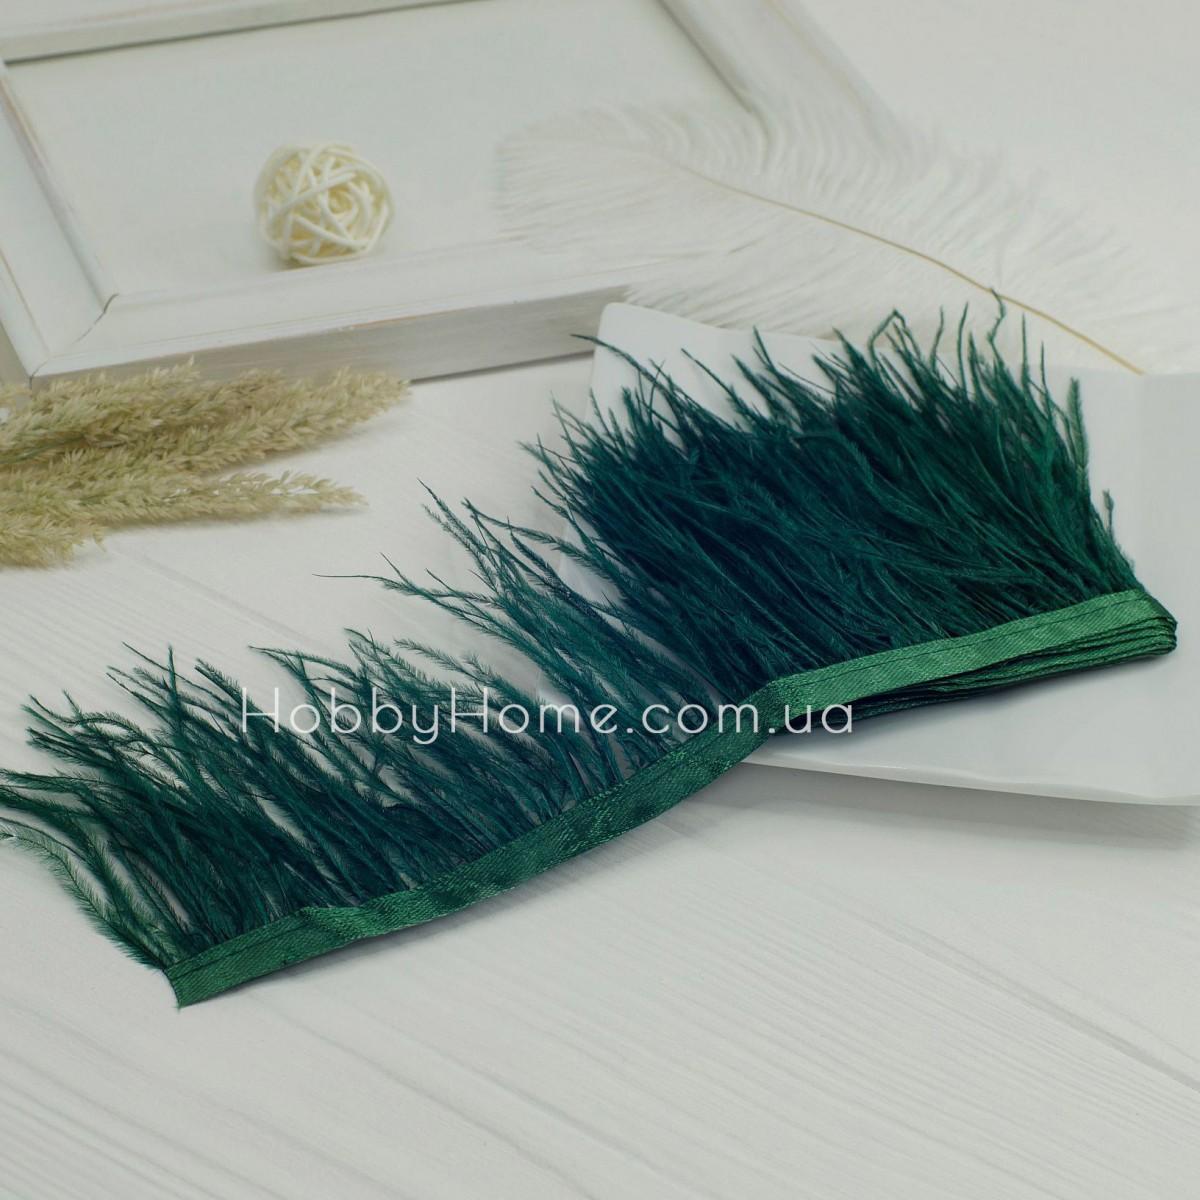 Пір'яна стрічка страуса 8-9см , смарагдова